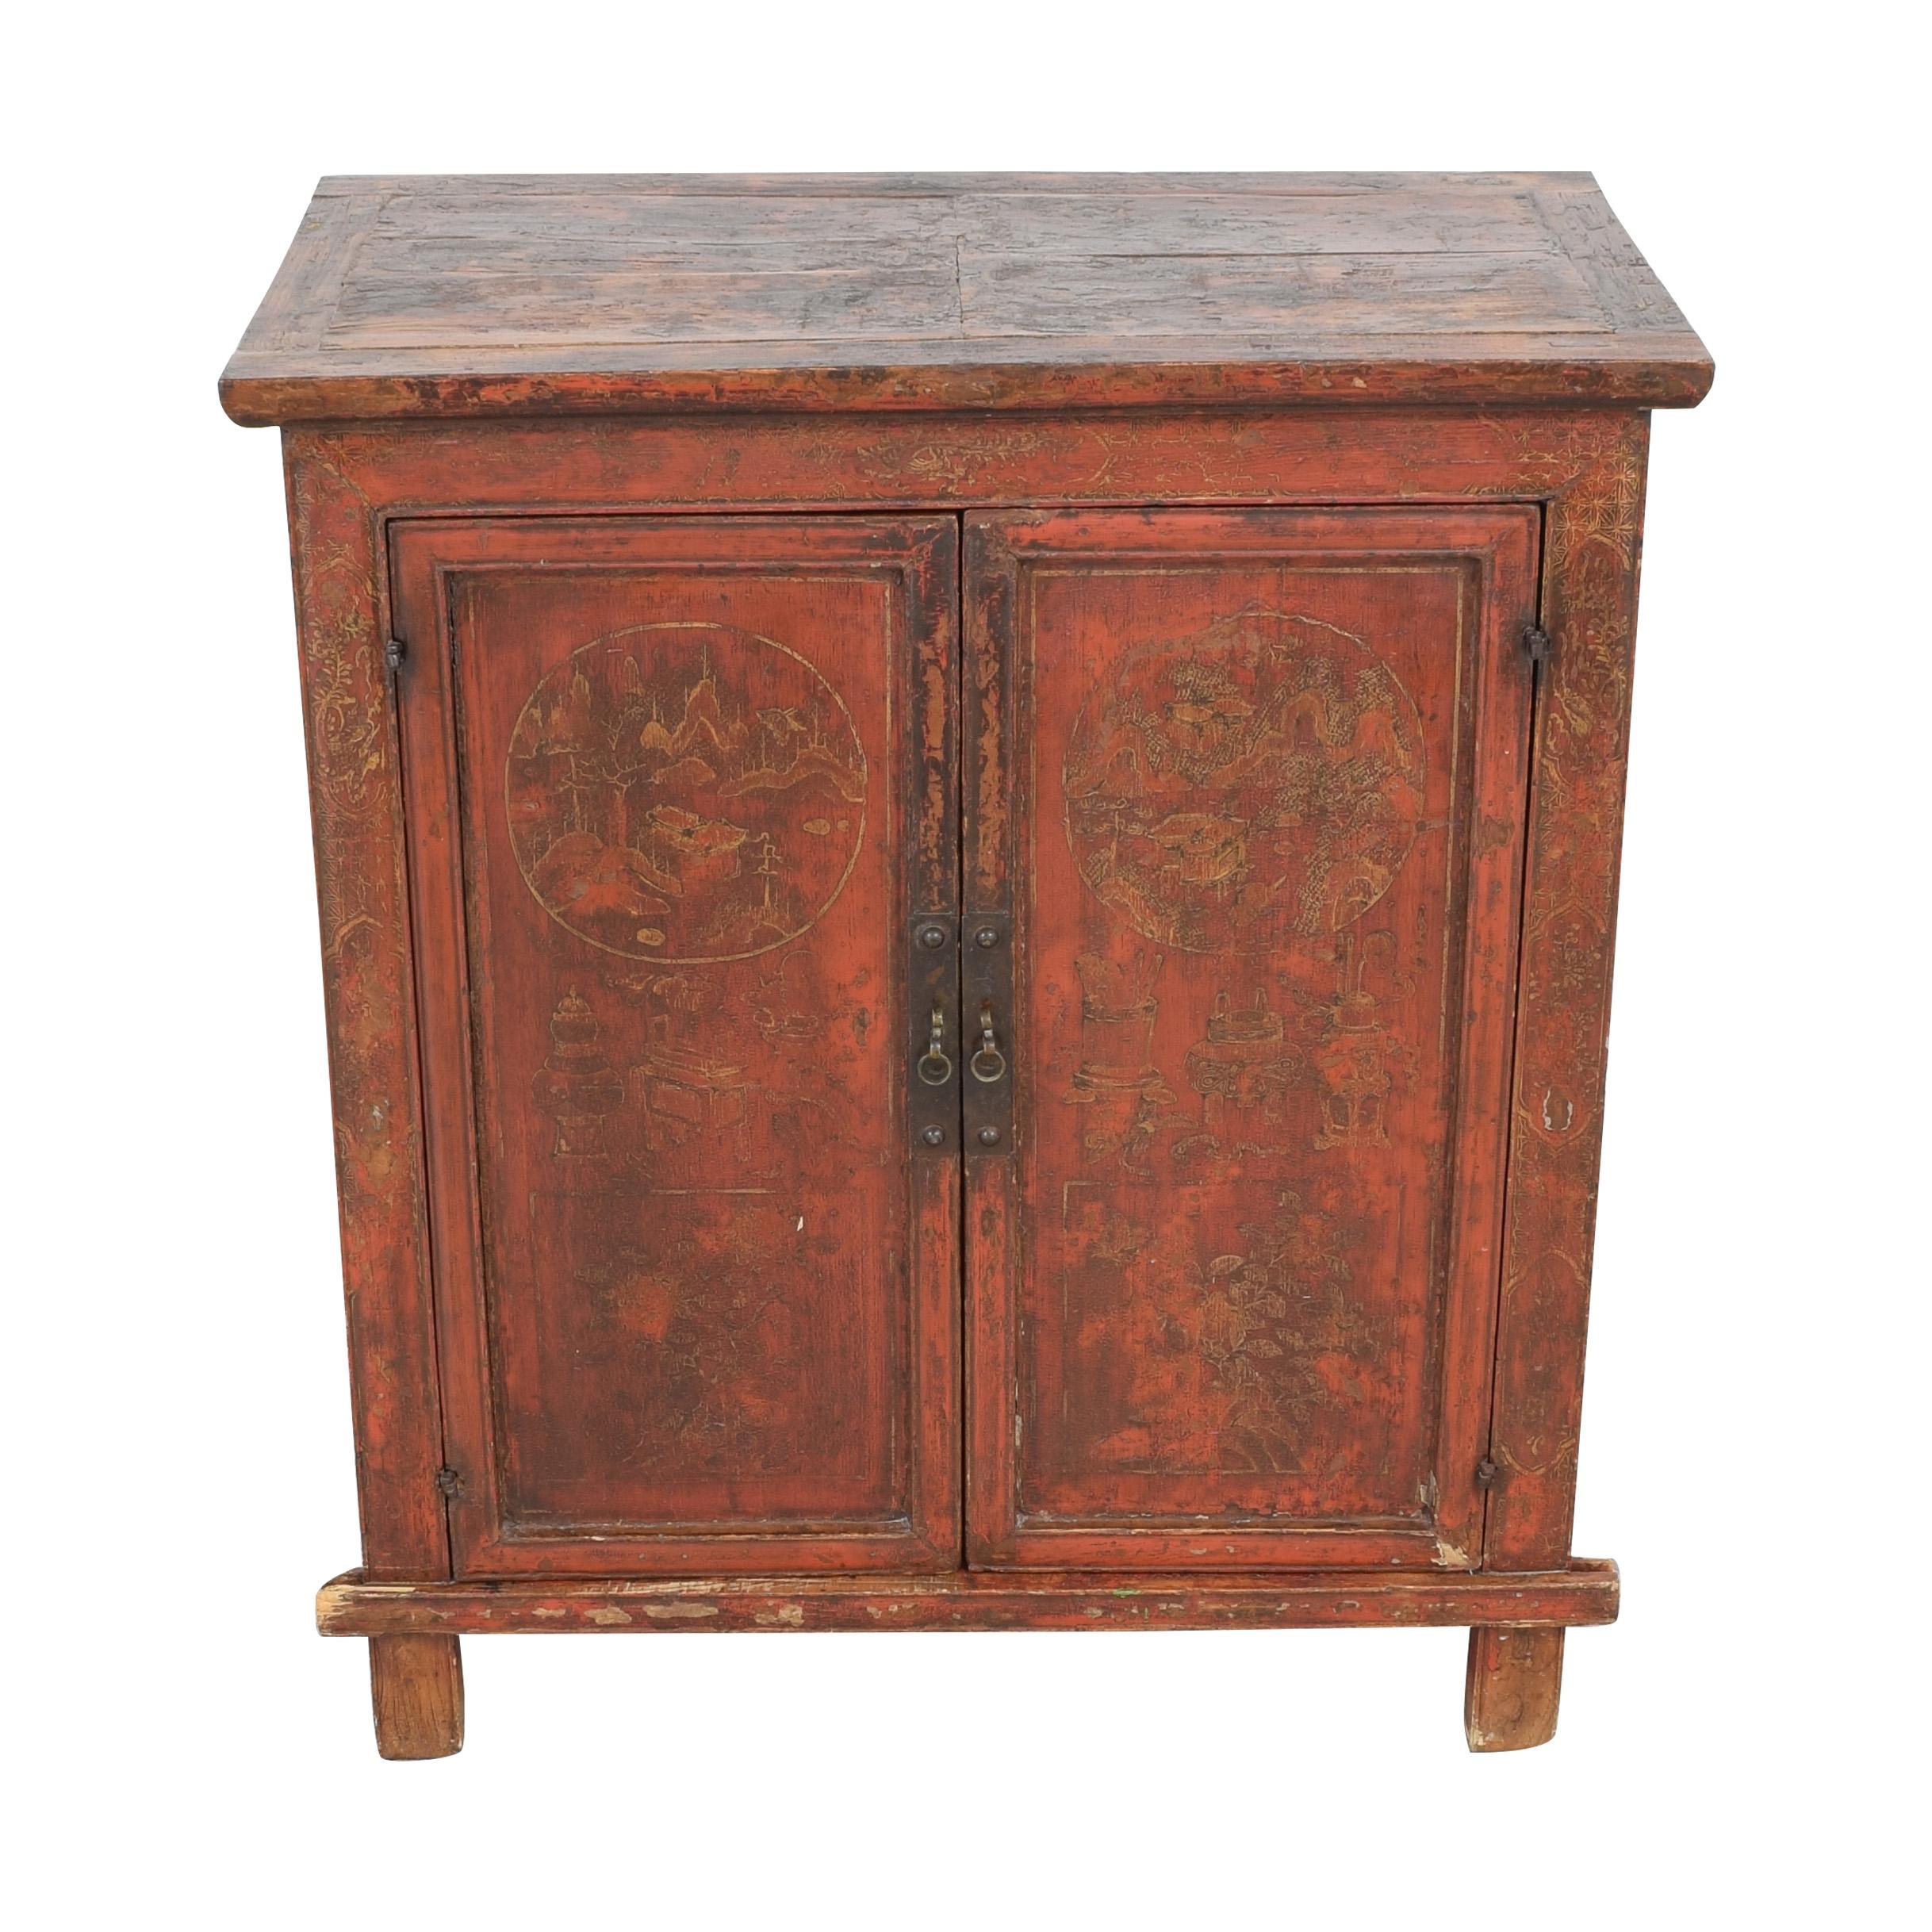 Vintage Cabinet second hand